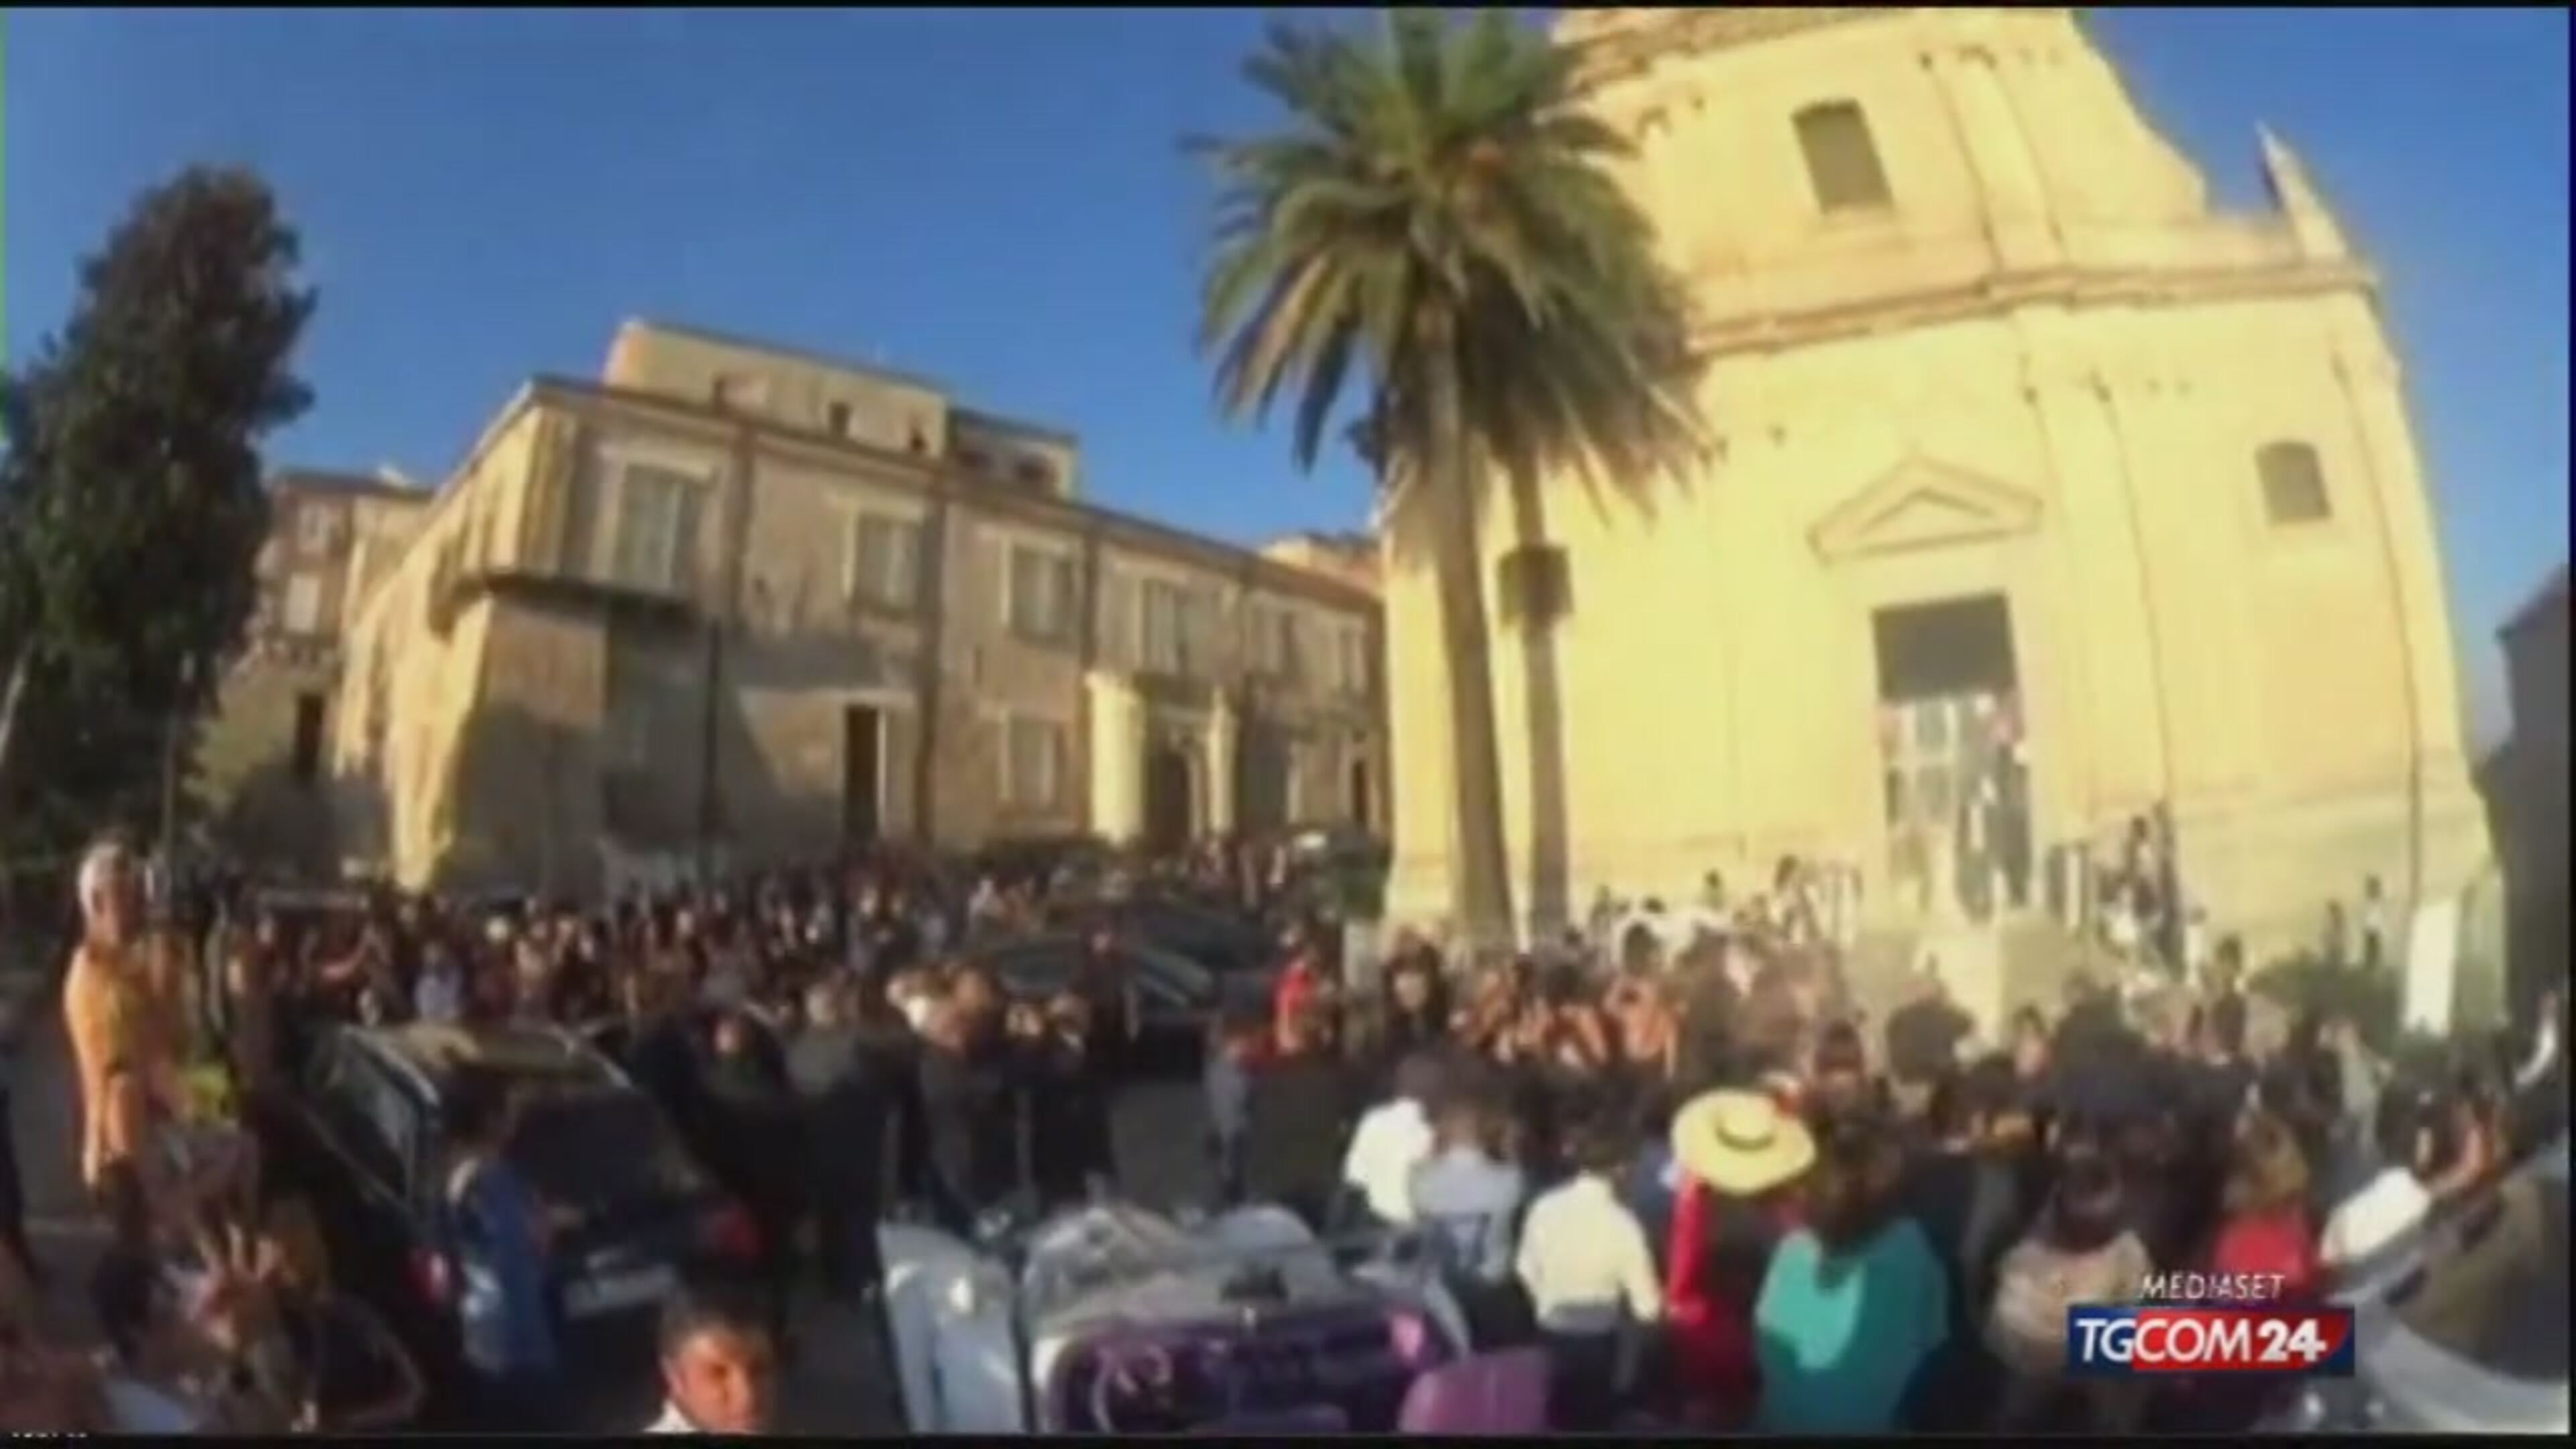 Elicottero Mediaset : Video tgcom elicottero in piazza per le nozze a